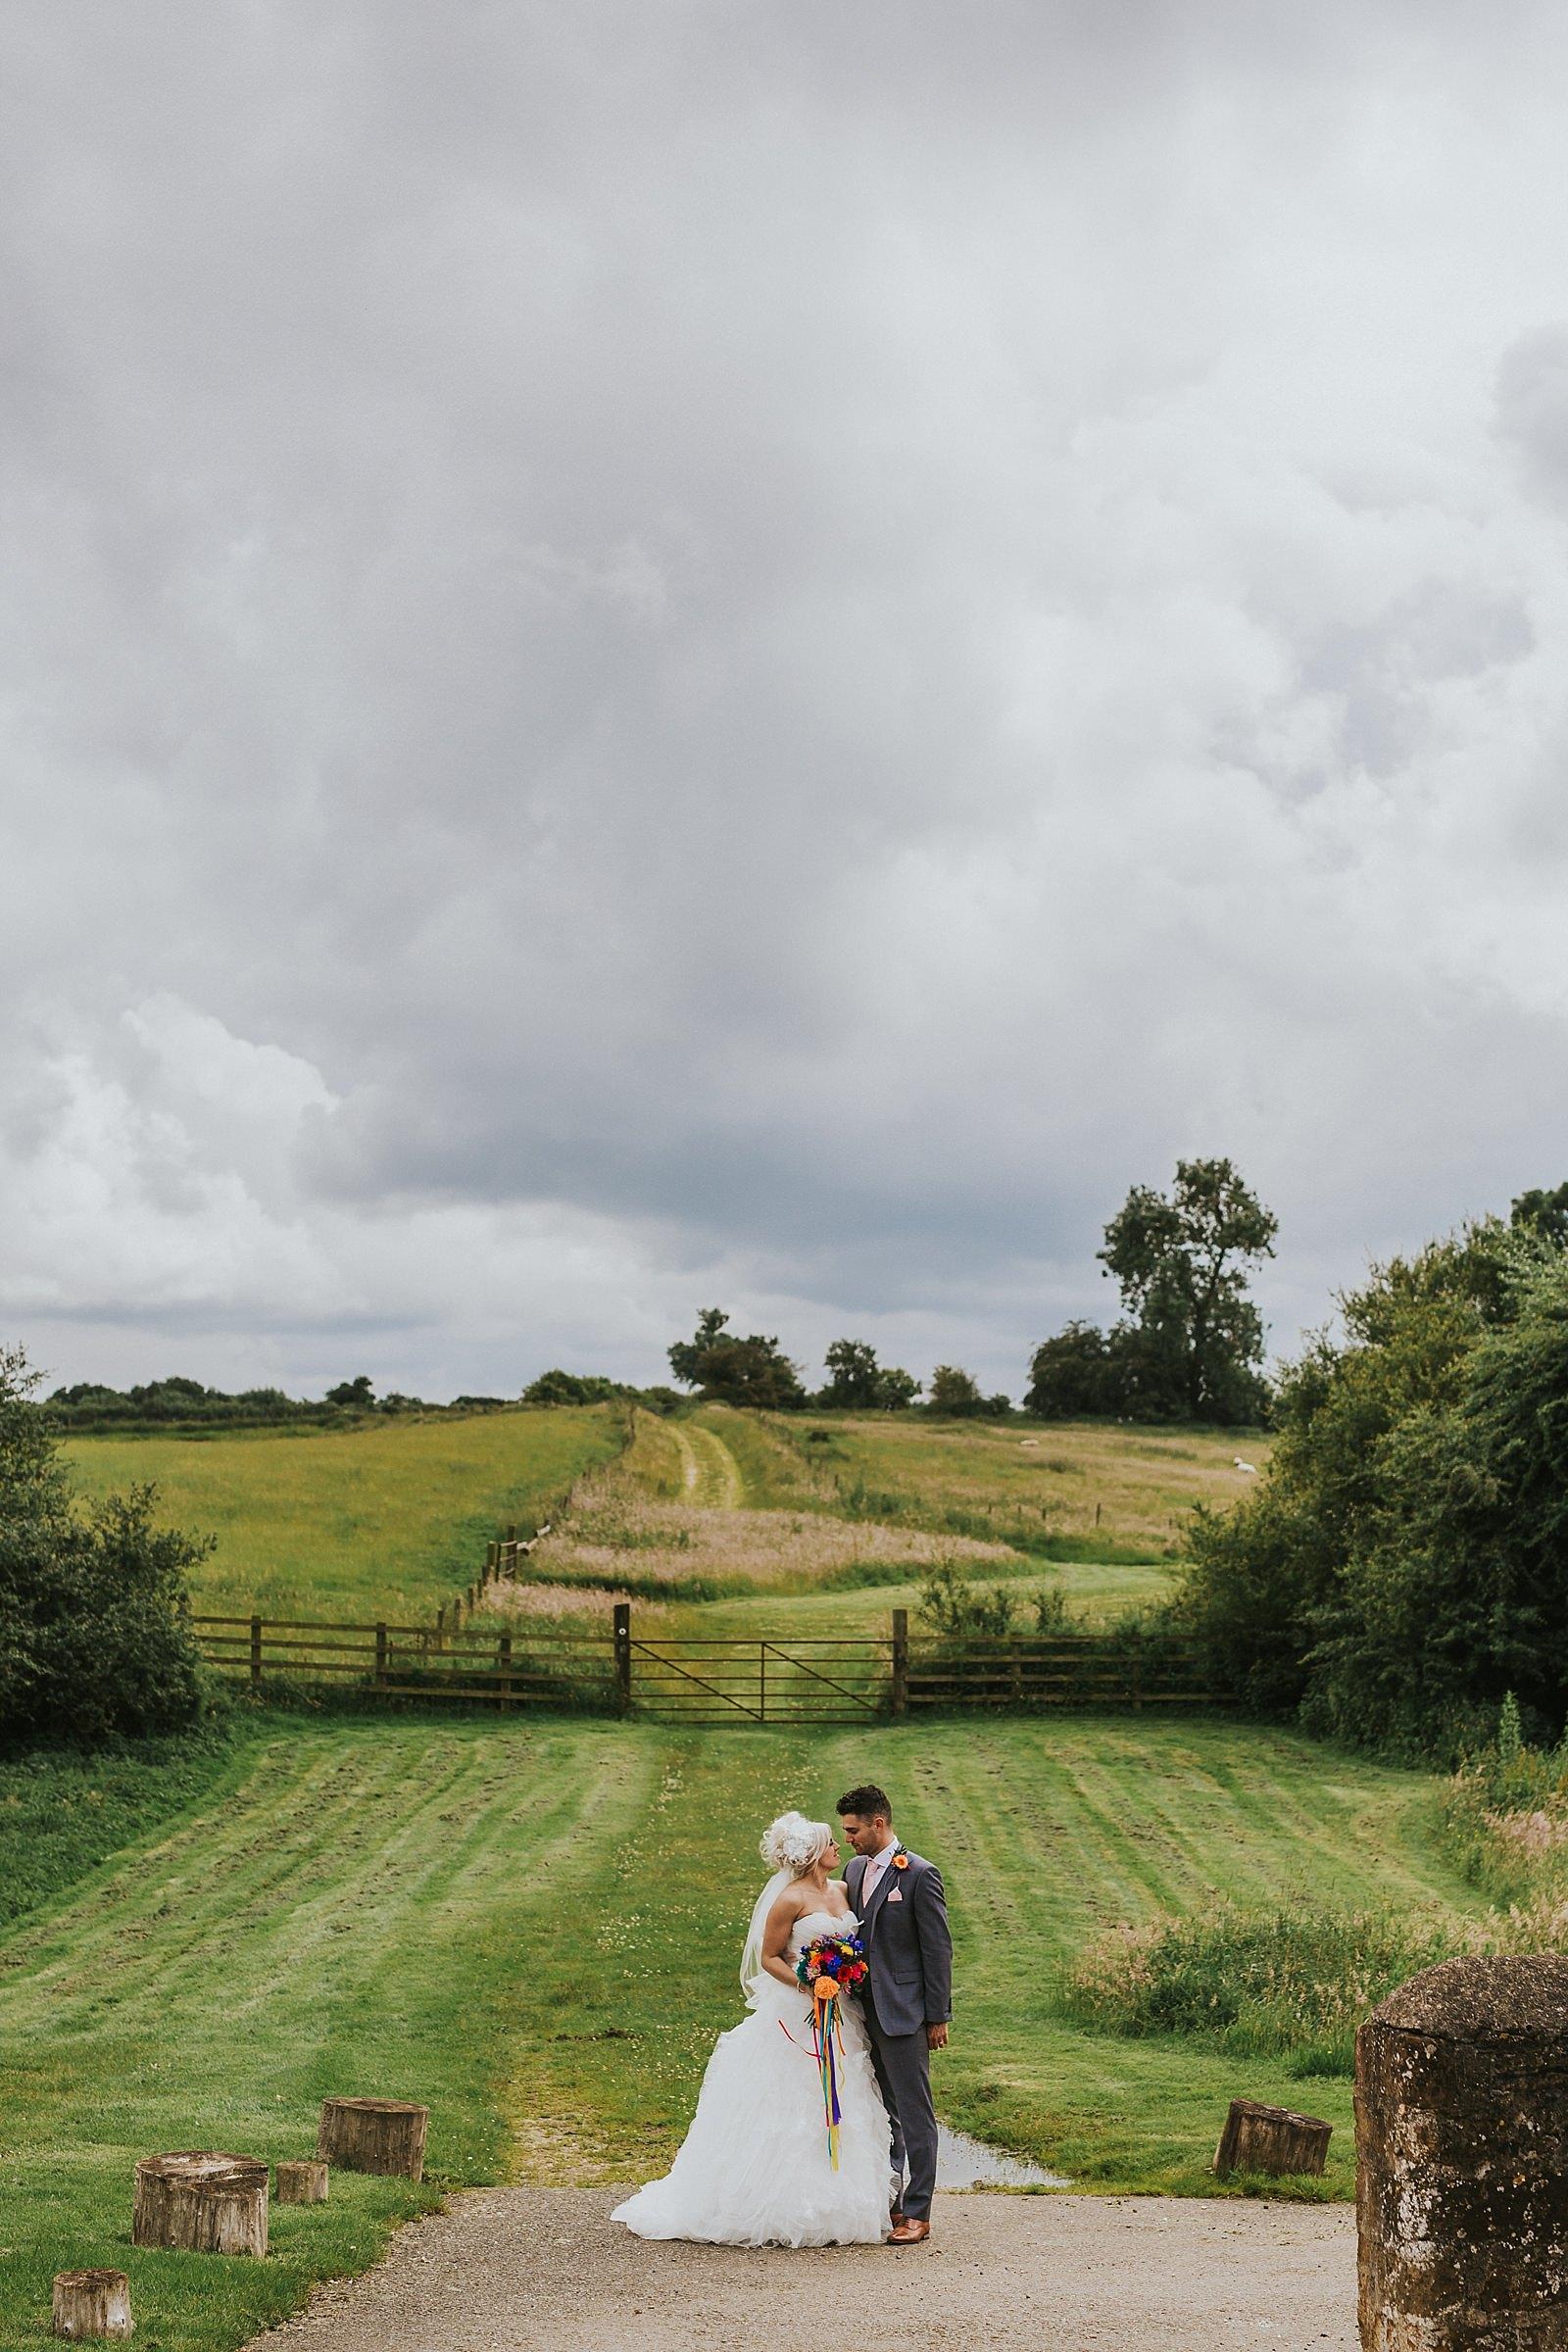 granary-at-fawsly-wedding-paula-stephen-369